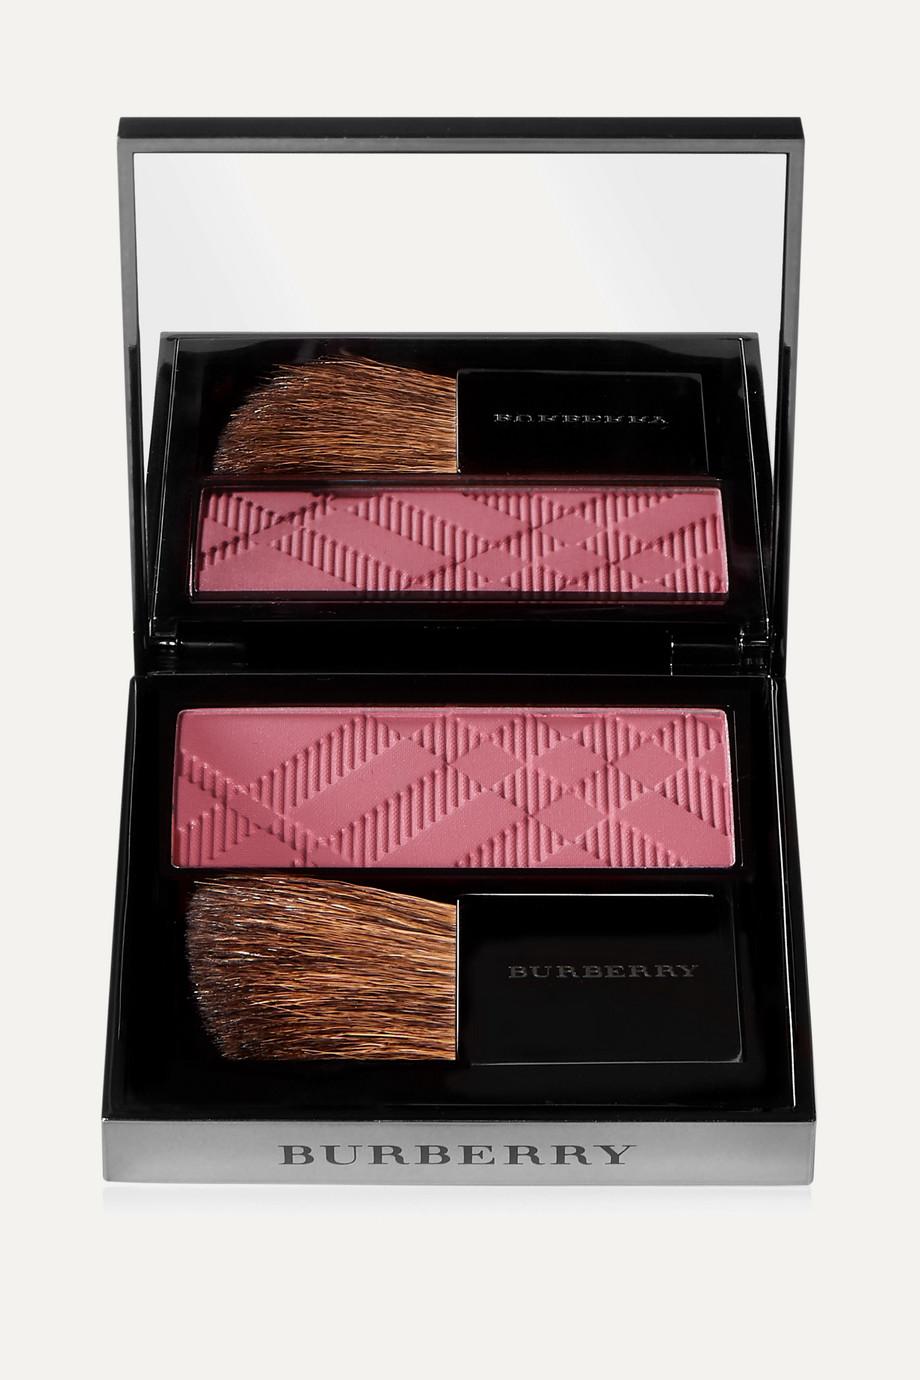 Burberry Beauty Light Glow Blush - Rose No.03